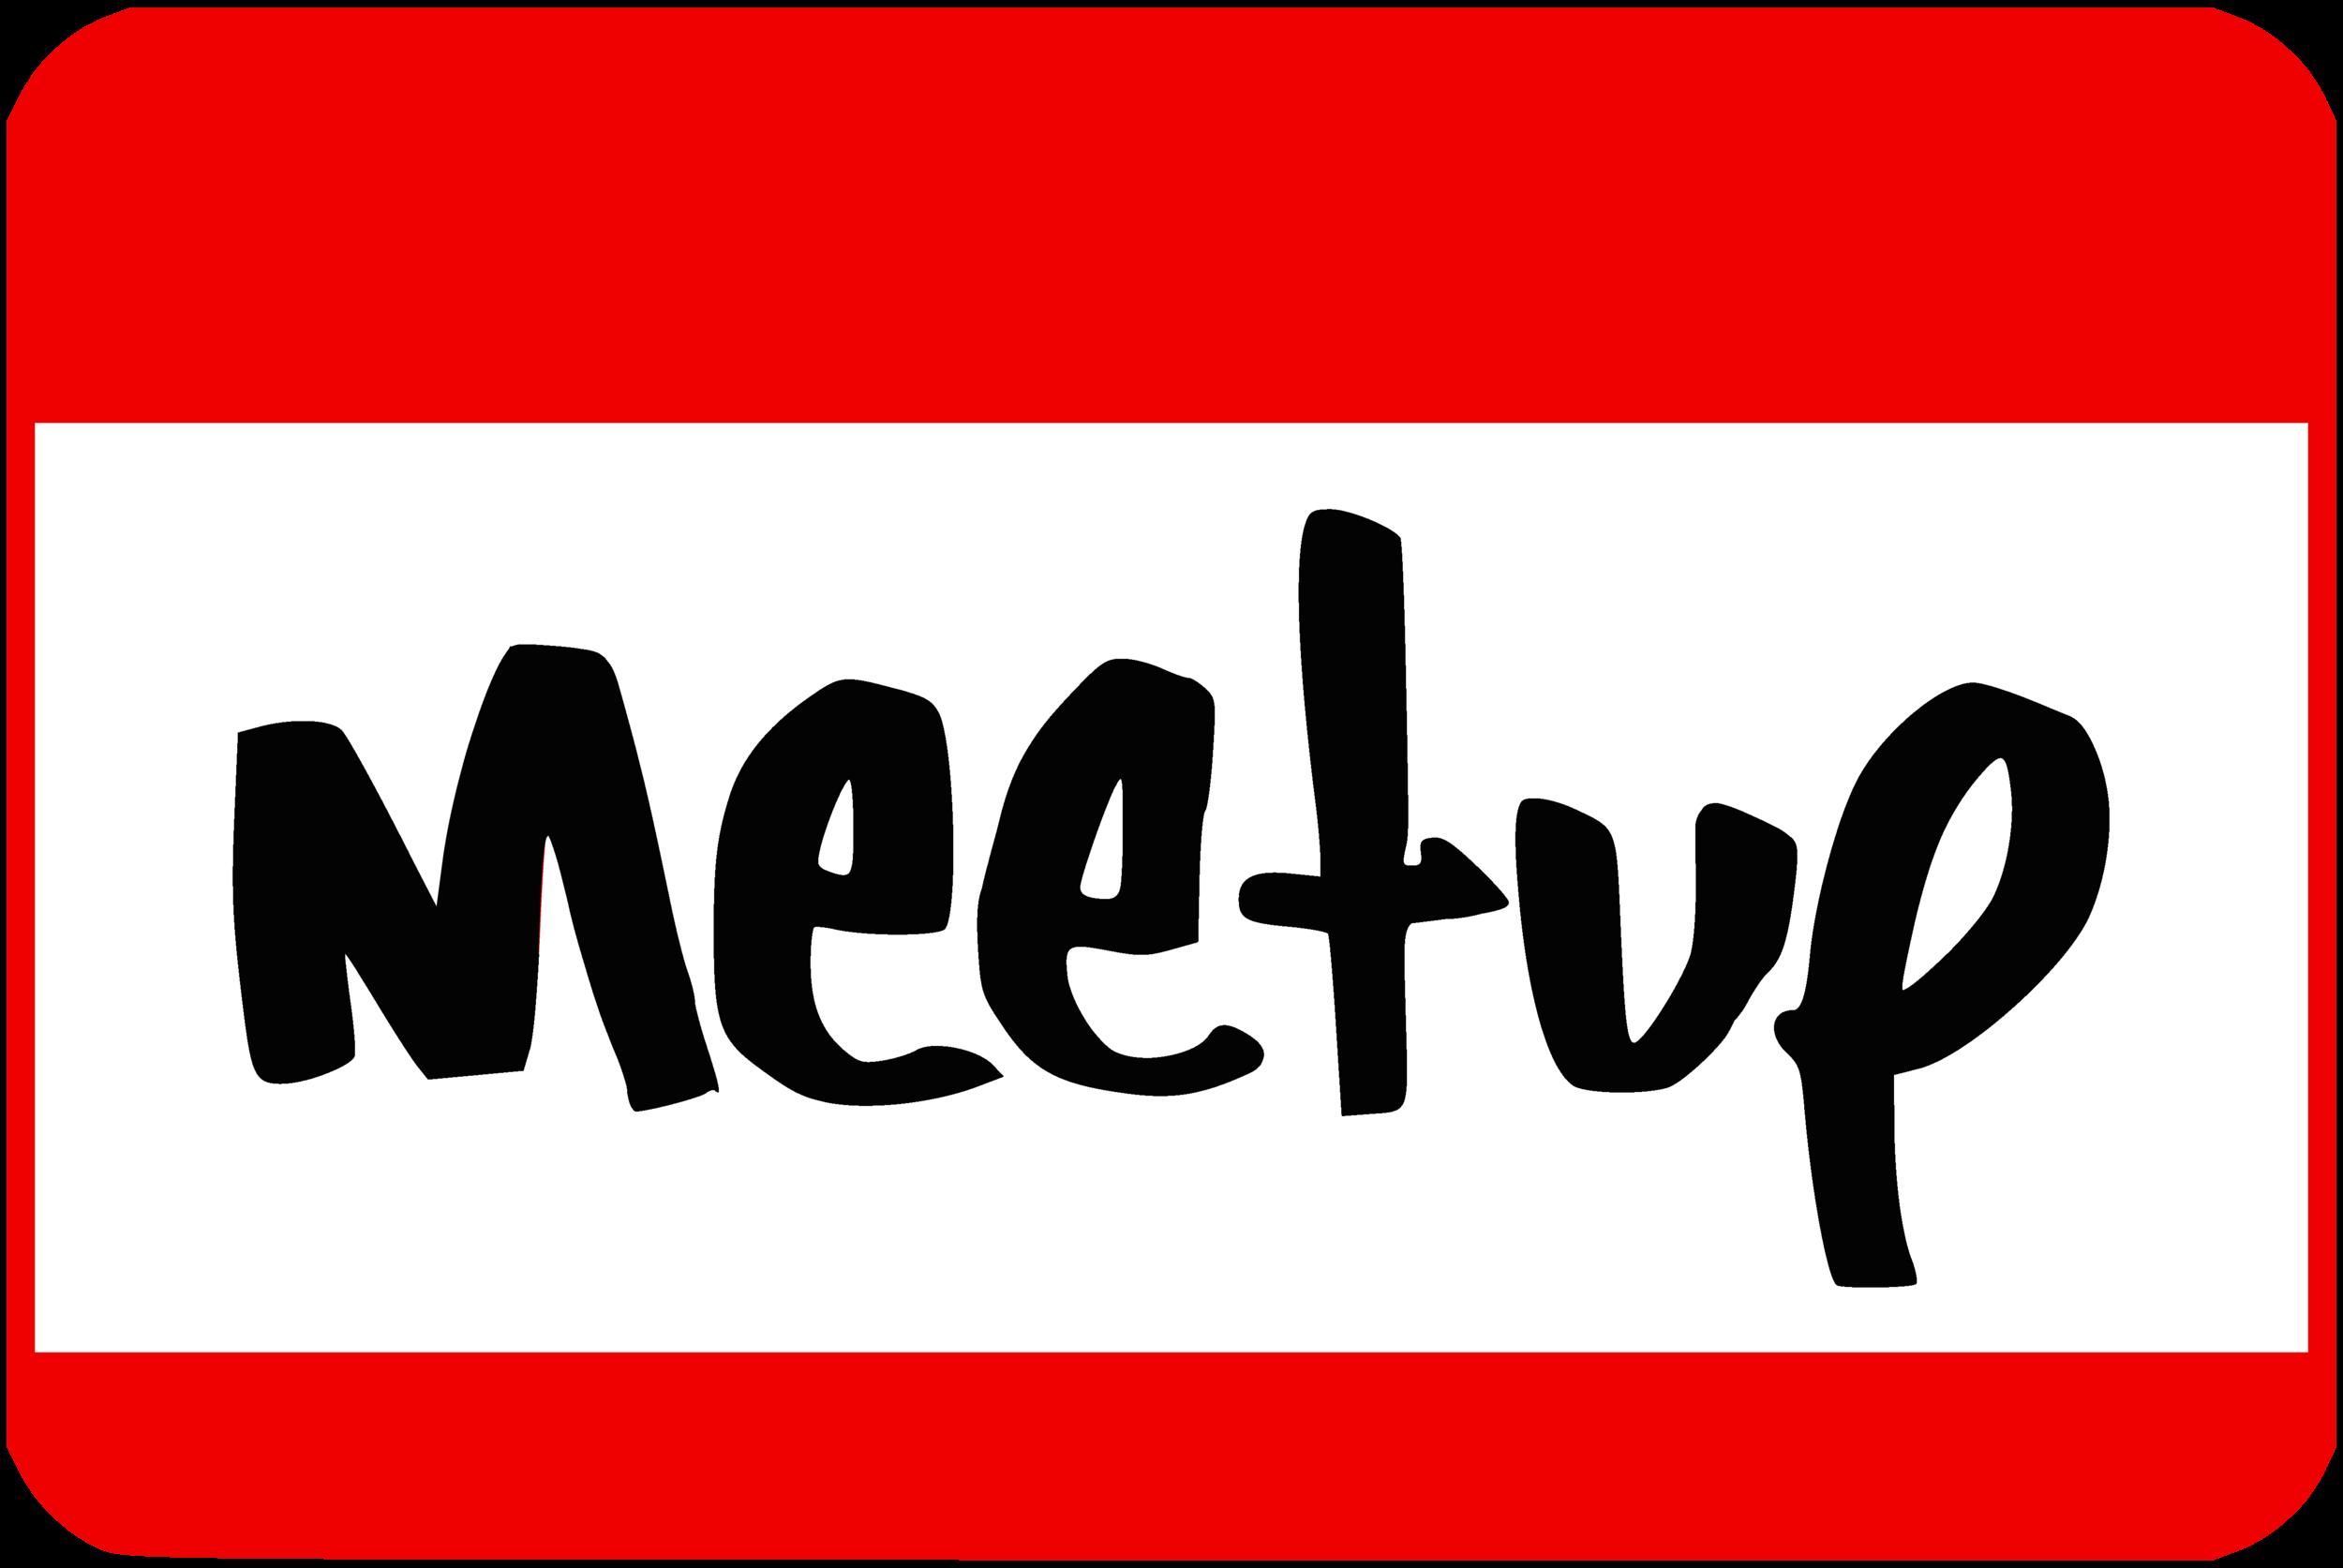 Follow us at meetup.com/AutonomyHub